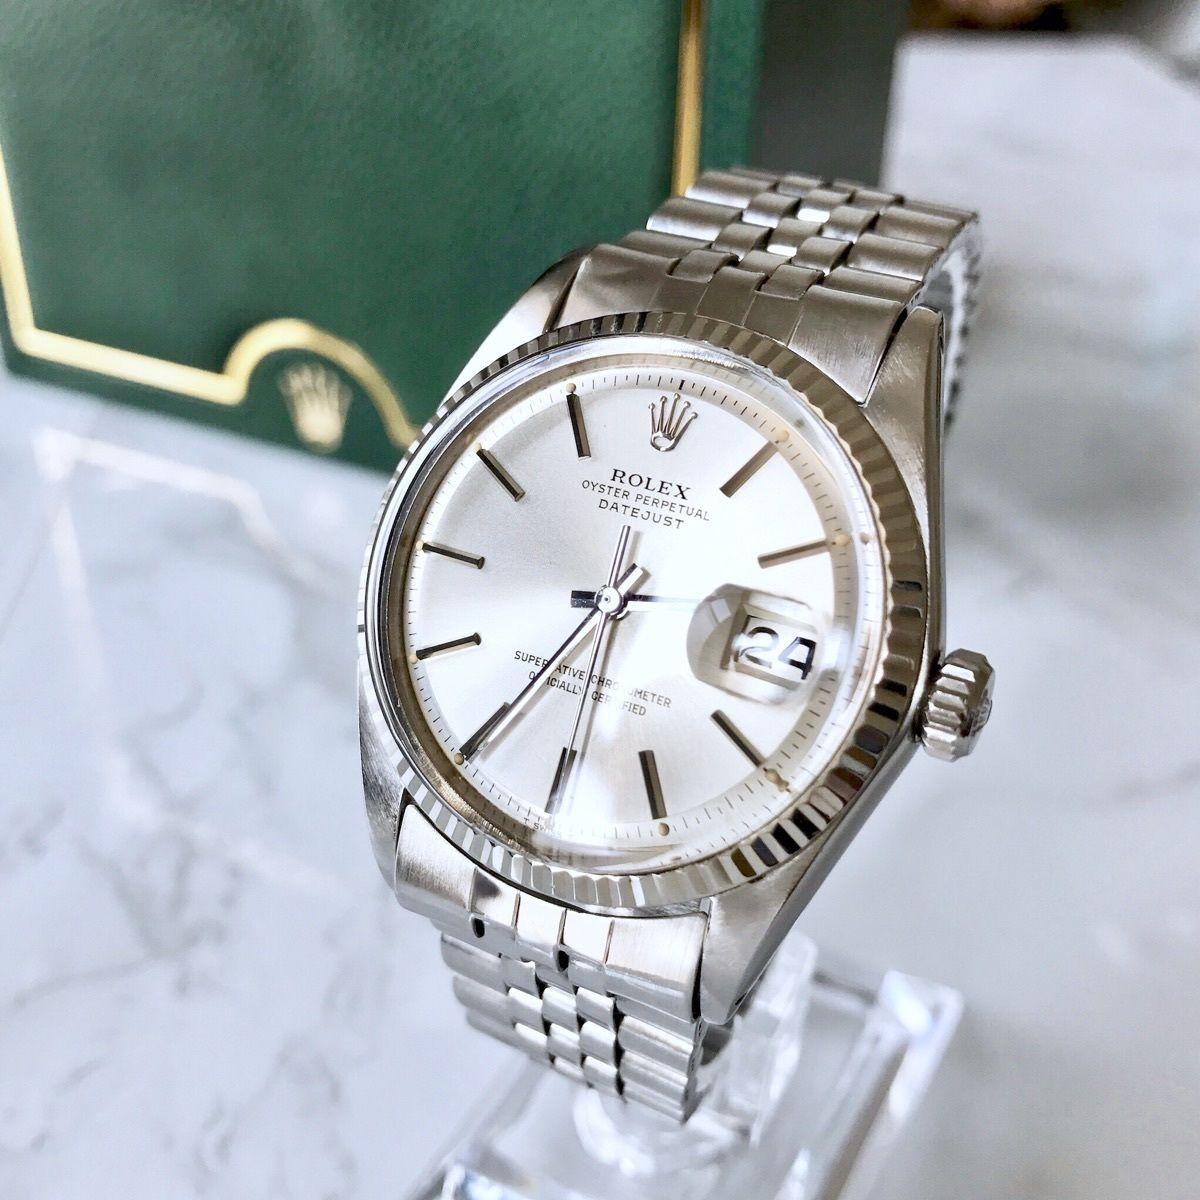 ROLEX ロレックス デイトジャ スト オイスター   K18WGベゼル 自動巻  メンズ 腕時計